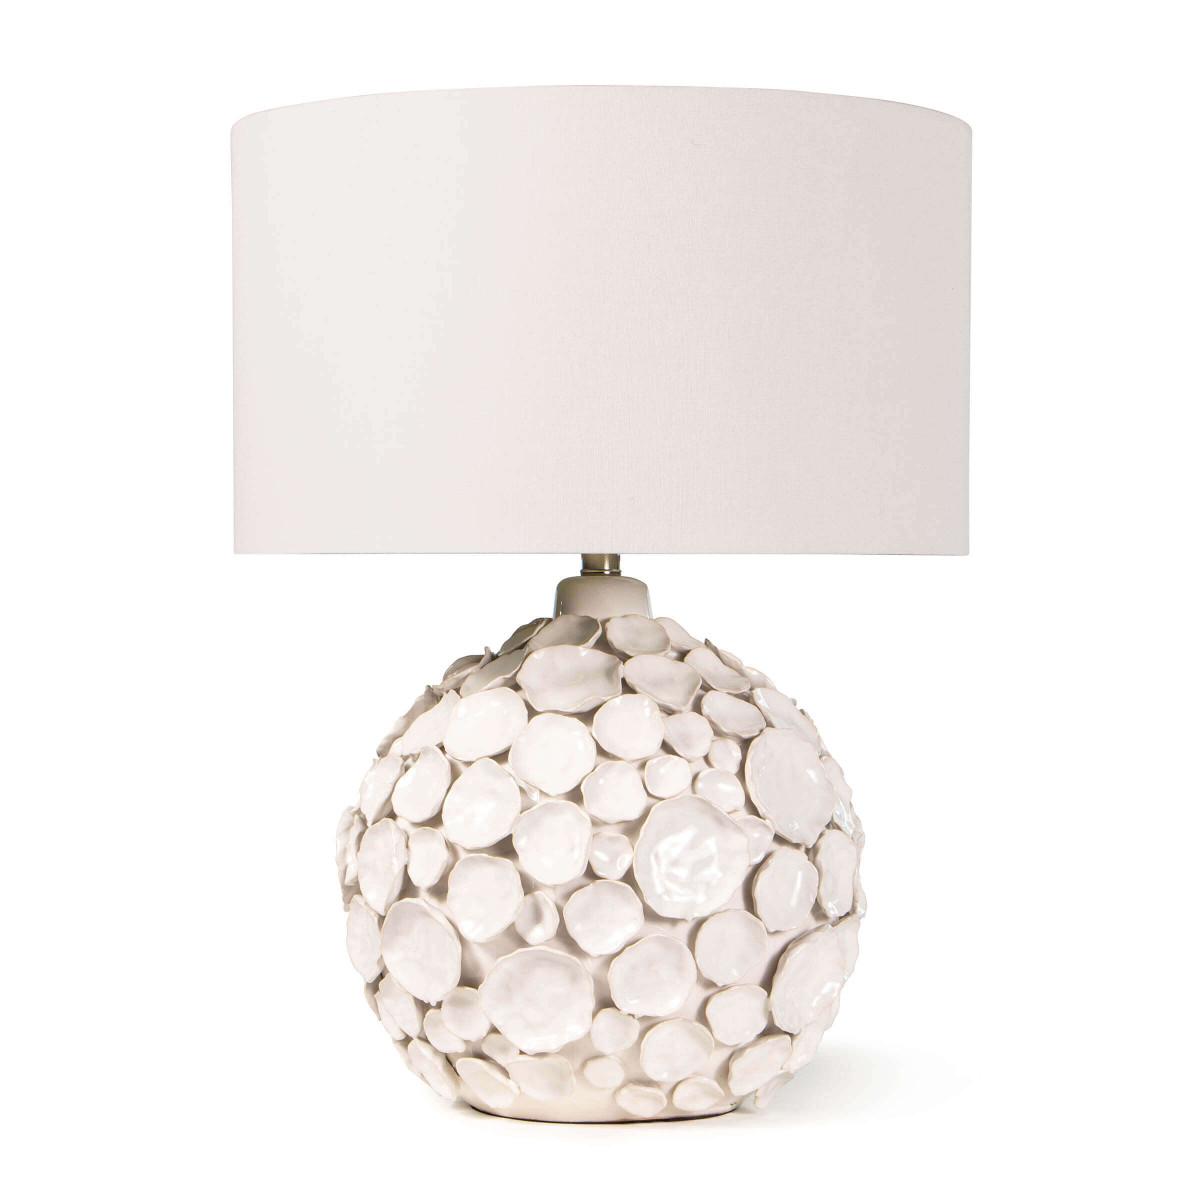 Cayman Ceramic Lamp-$672.00